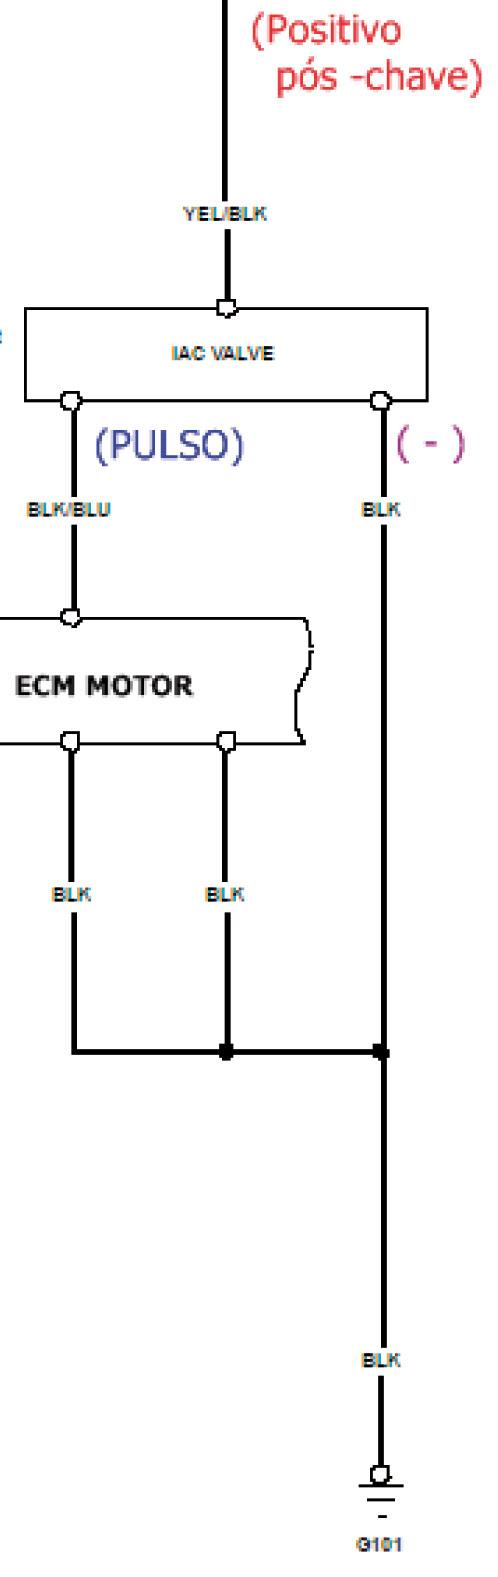 Figura 5 - Diagrama elétrico válvula IAC